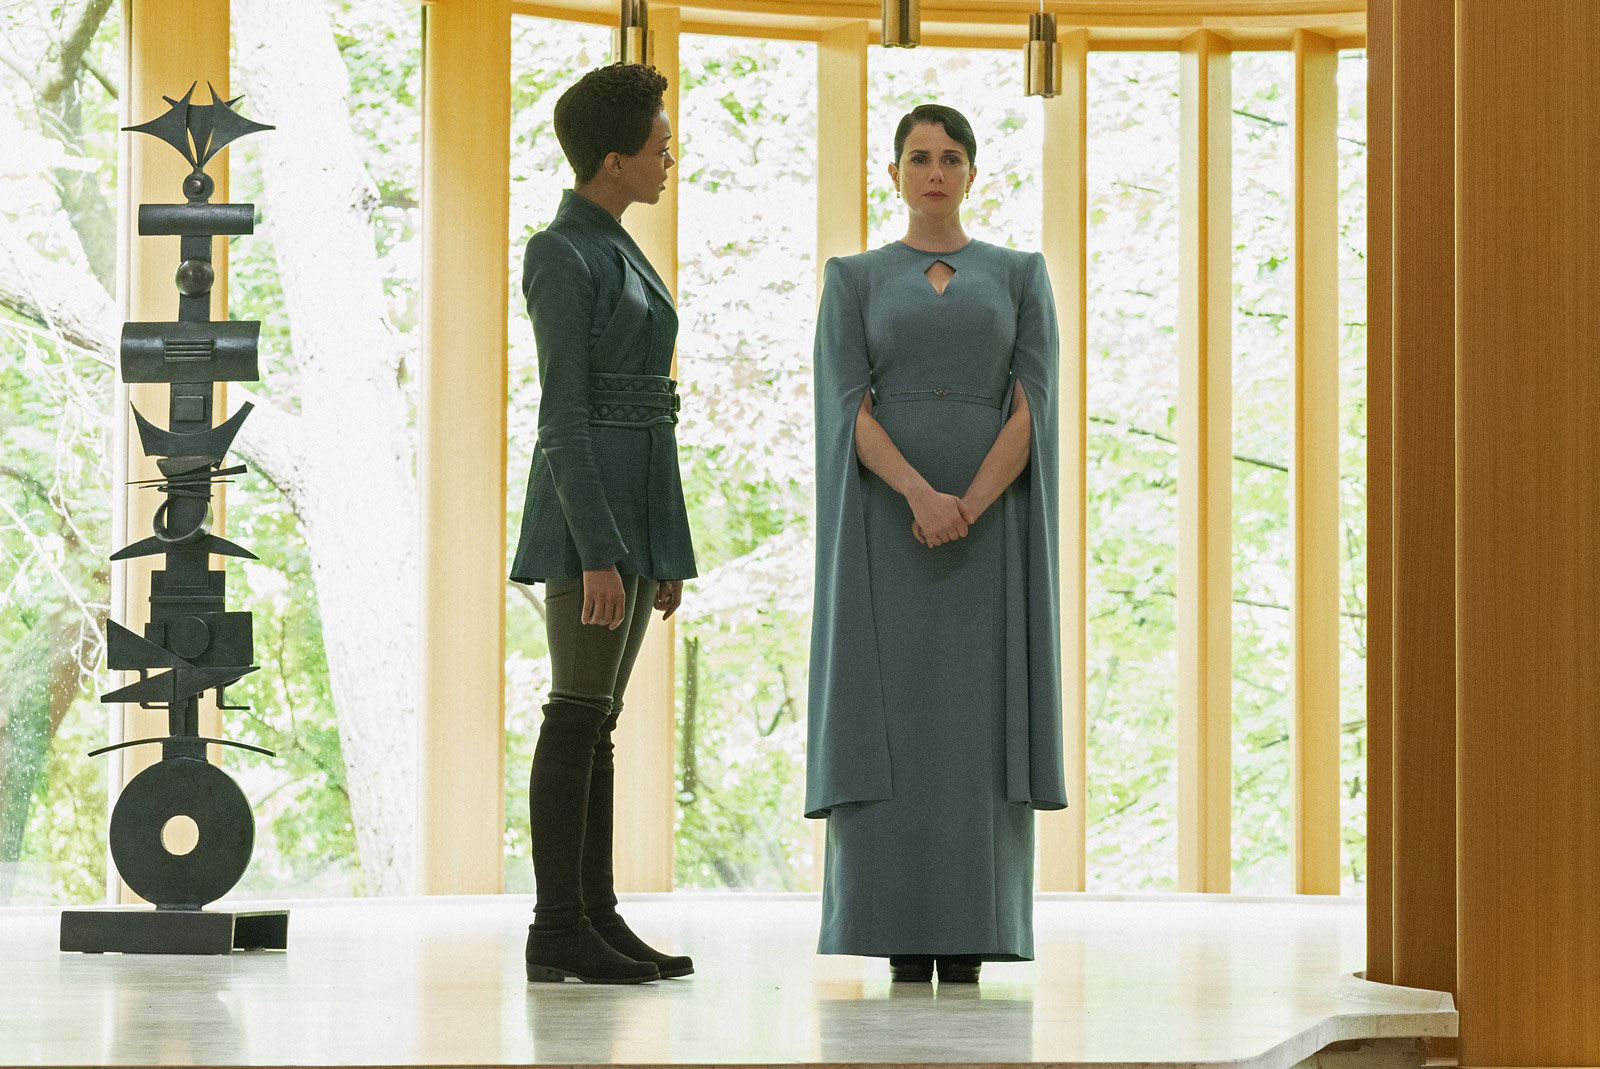 Sonequa Martin-Green as Michael Burnham and Mia Kirshner as Amanda